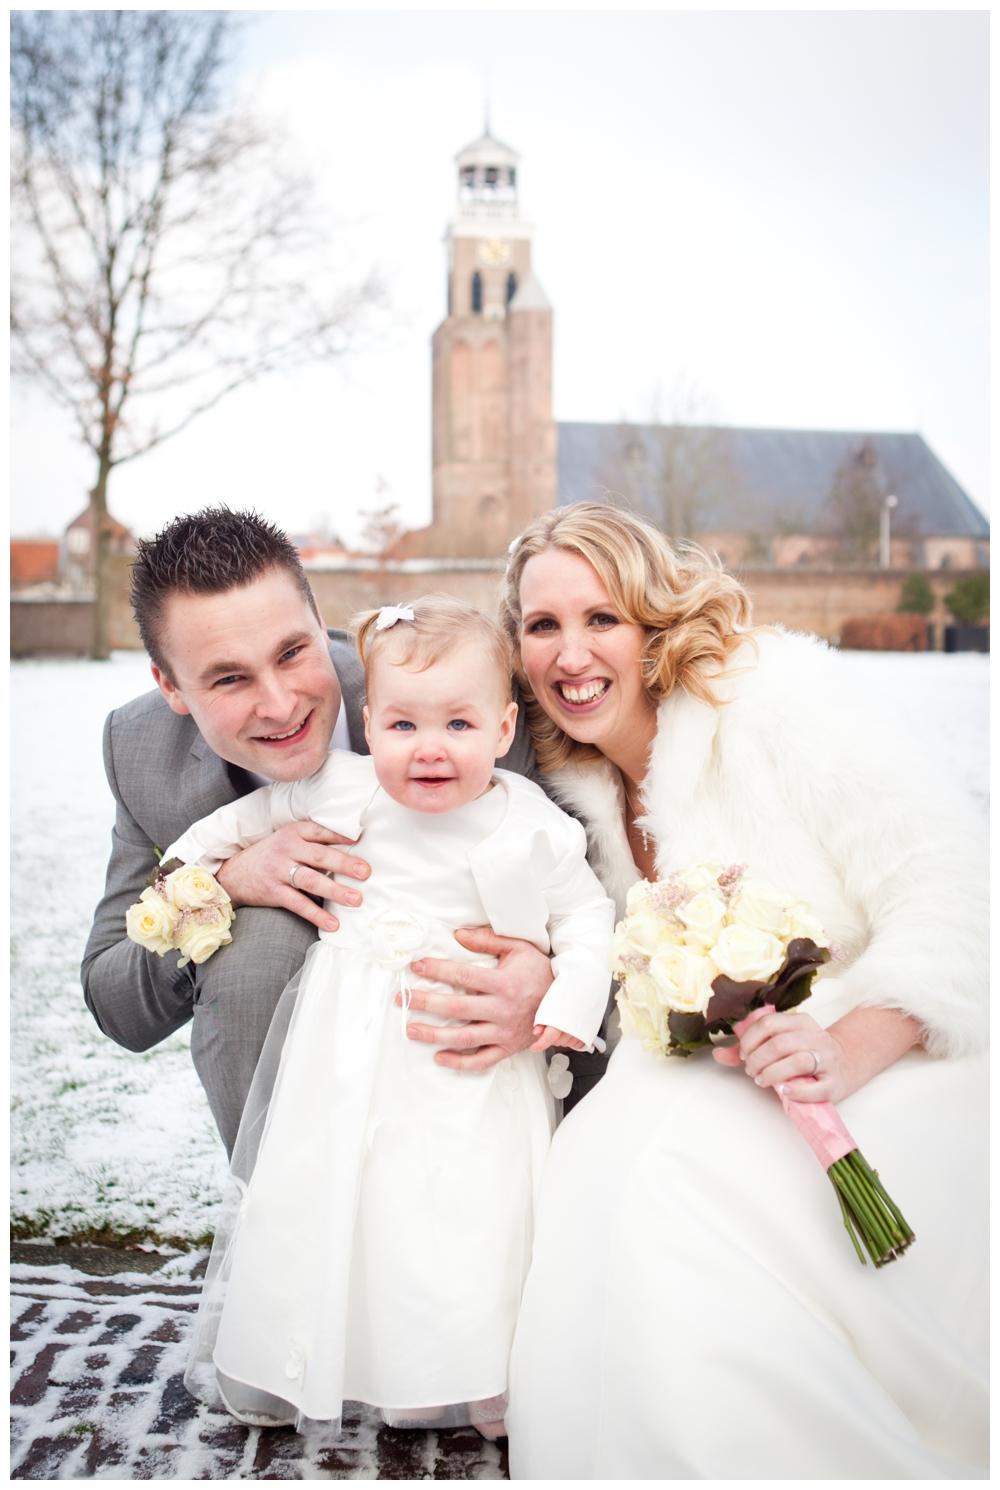 Wedding-RobbertMarlon-KL130.jpg